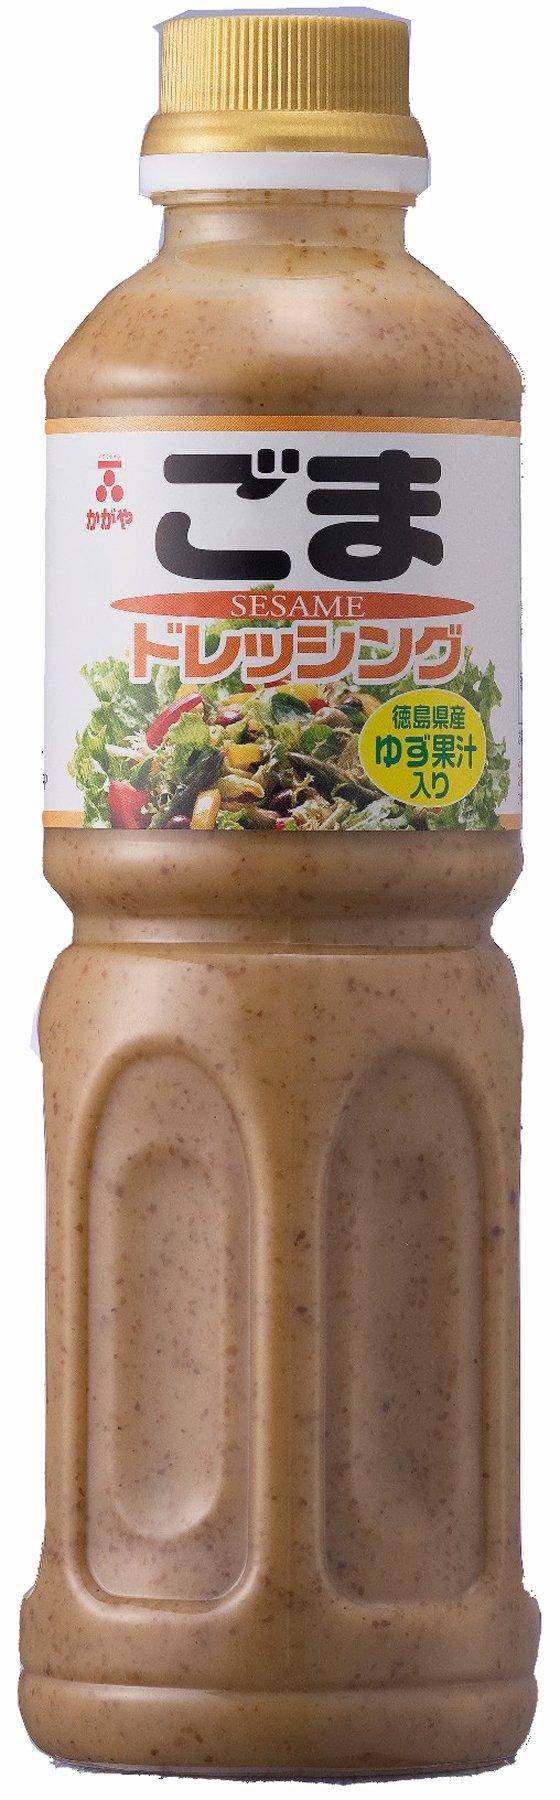 Ichimitsuboshi sesame dressing citron fruit juice 500mlX3 this